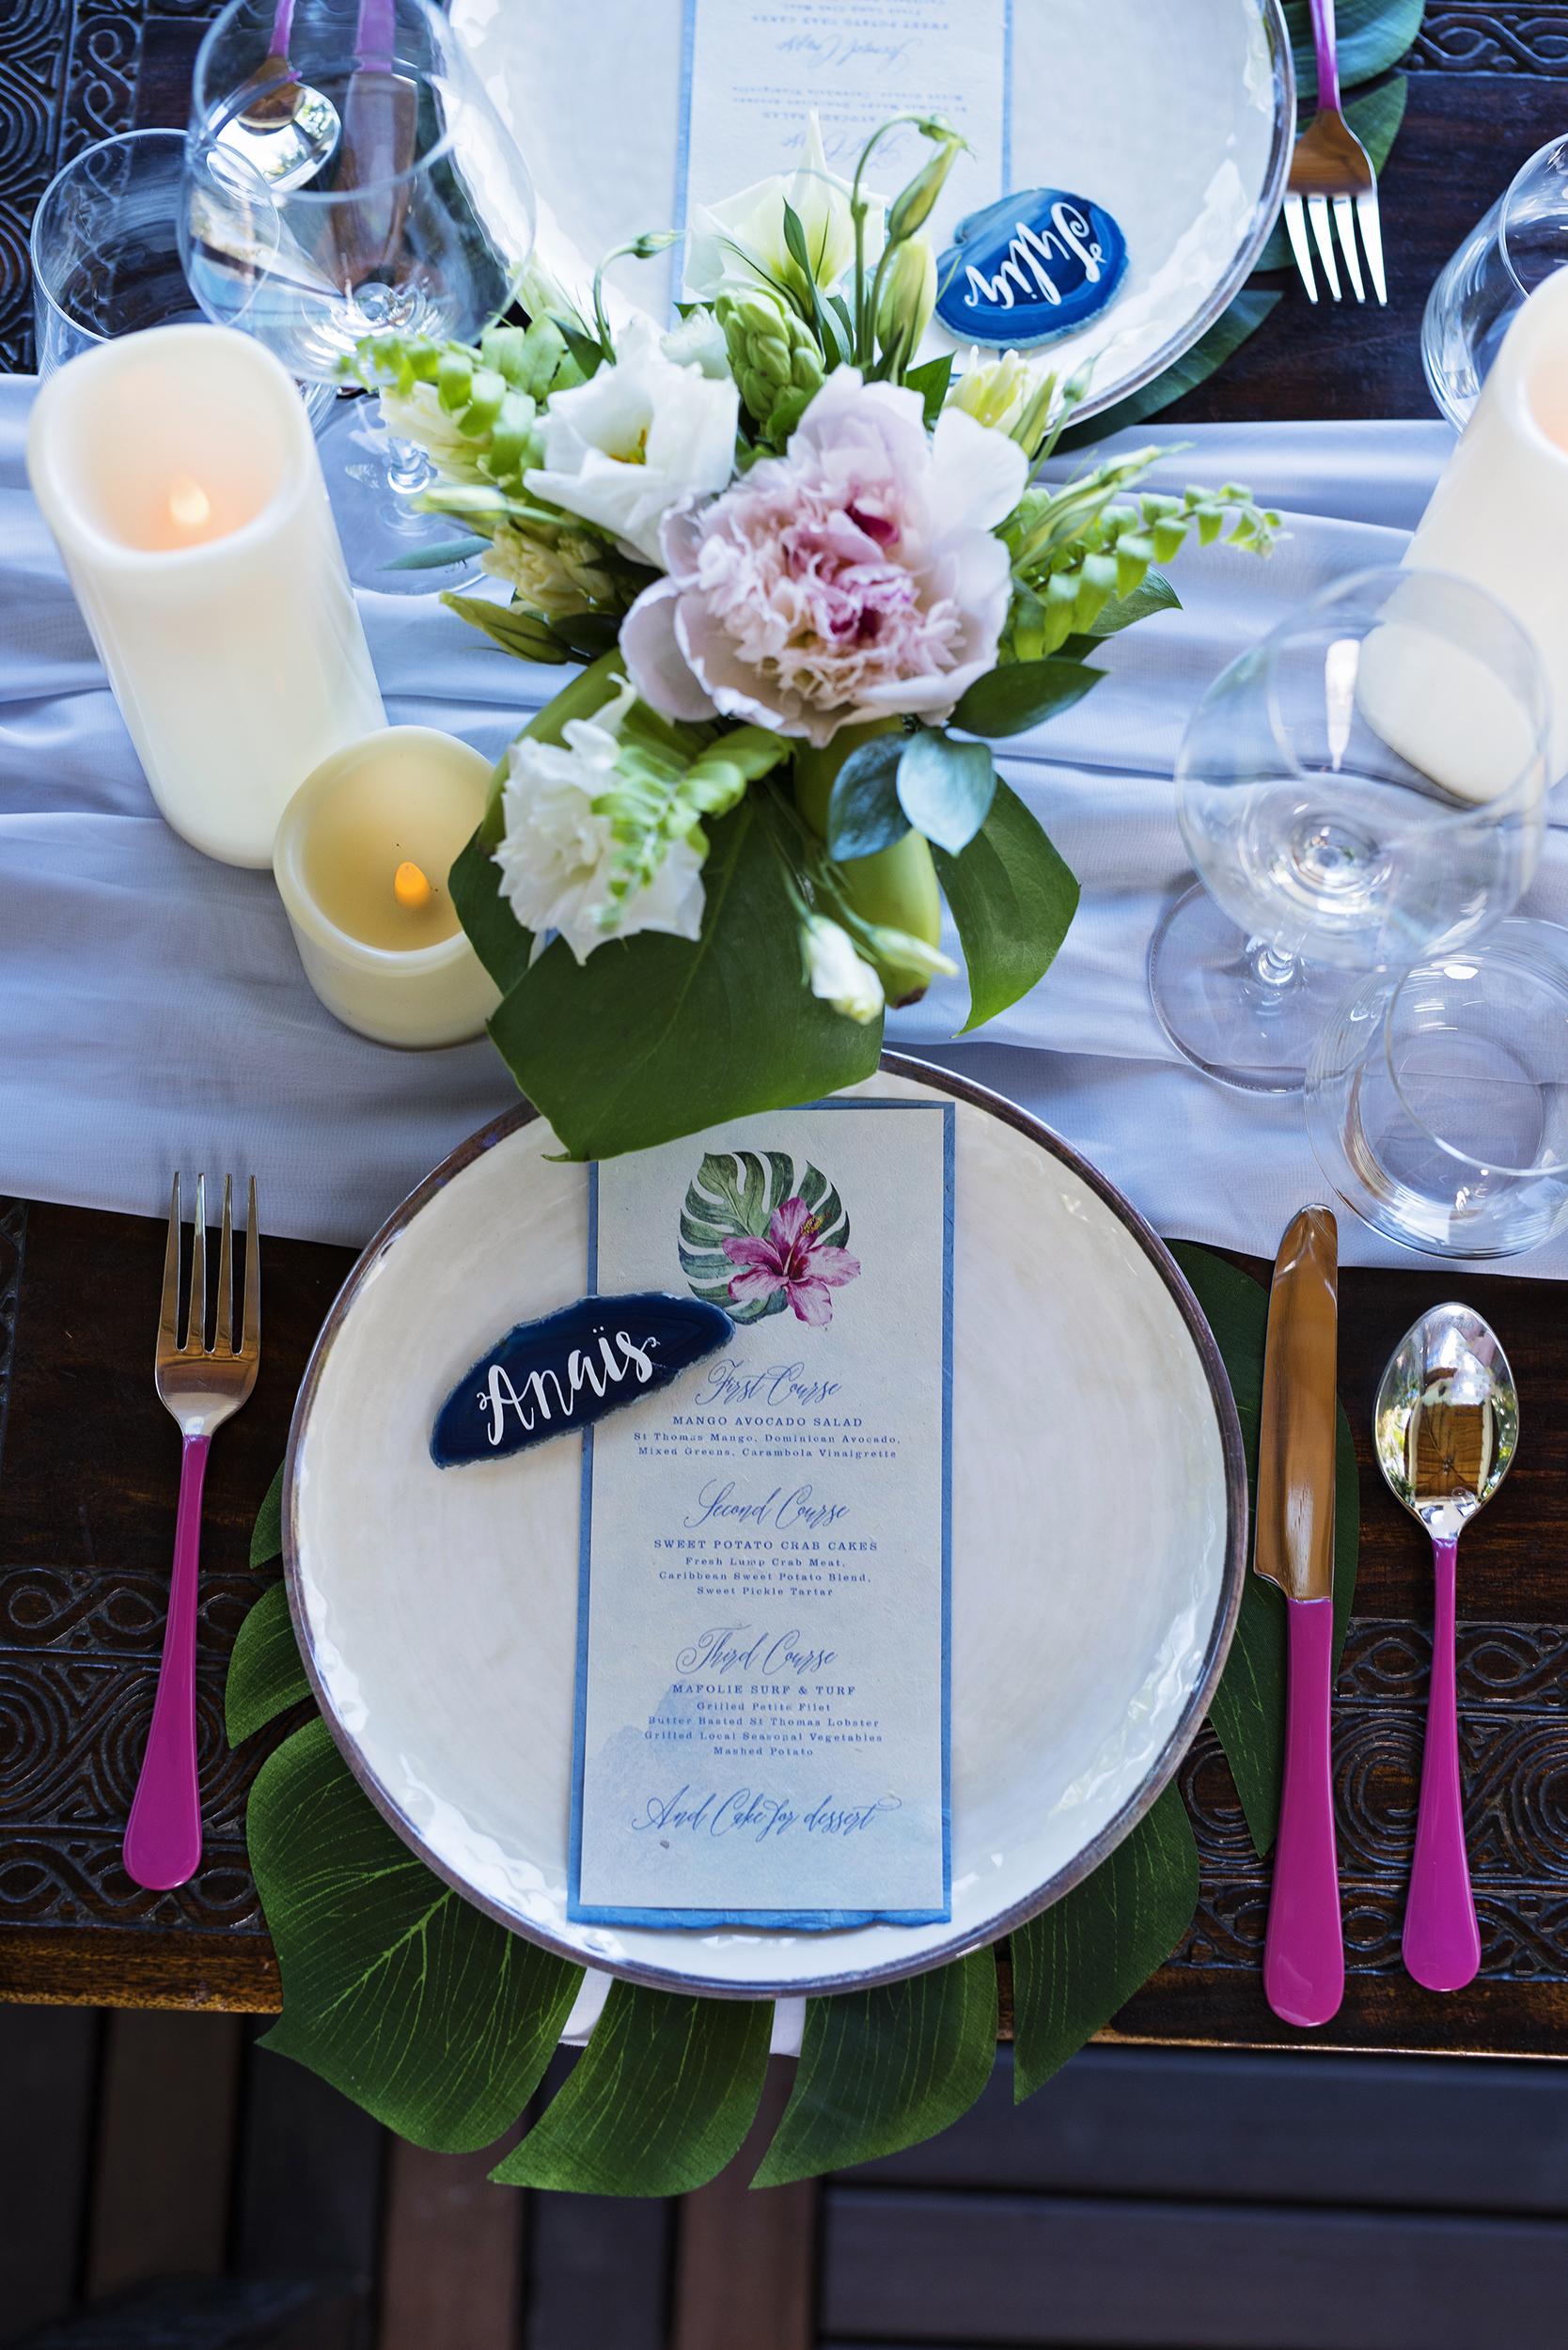 Wedding Venues on St. Thomas - Destination Weddings in the USVI - USVI Wedding Planning